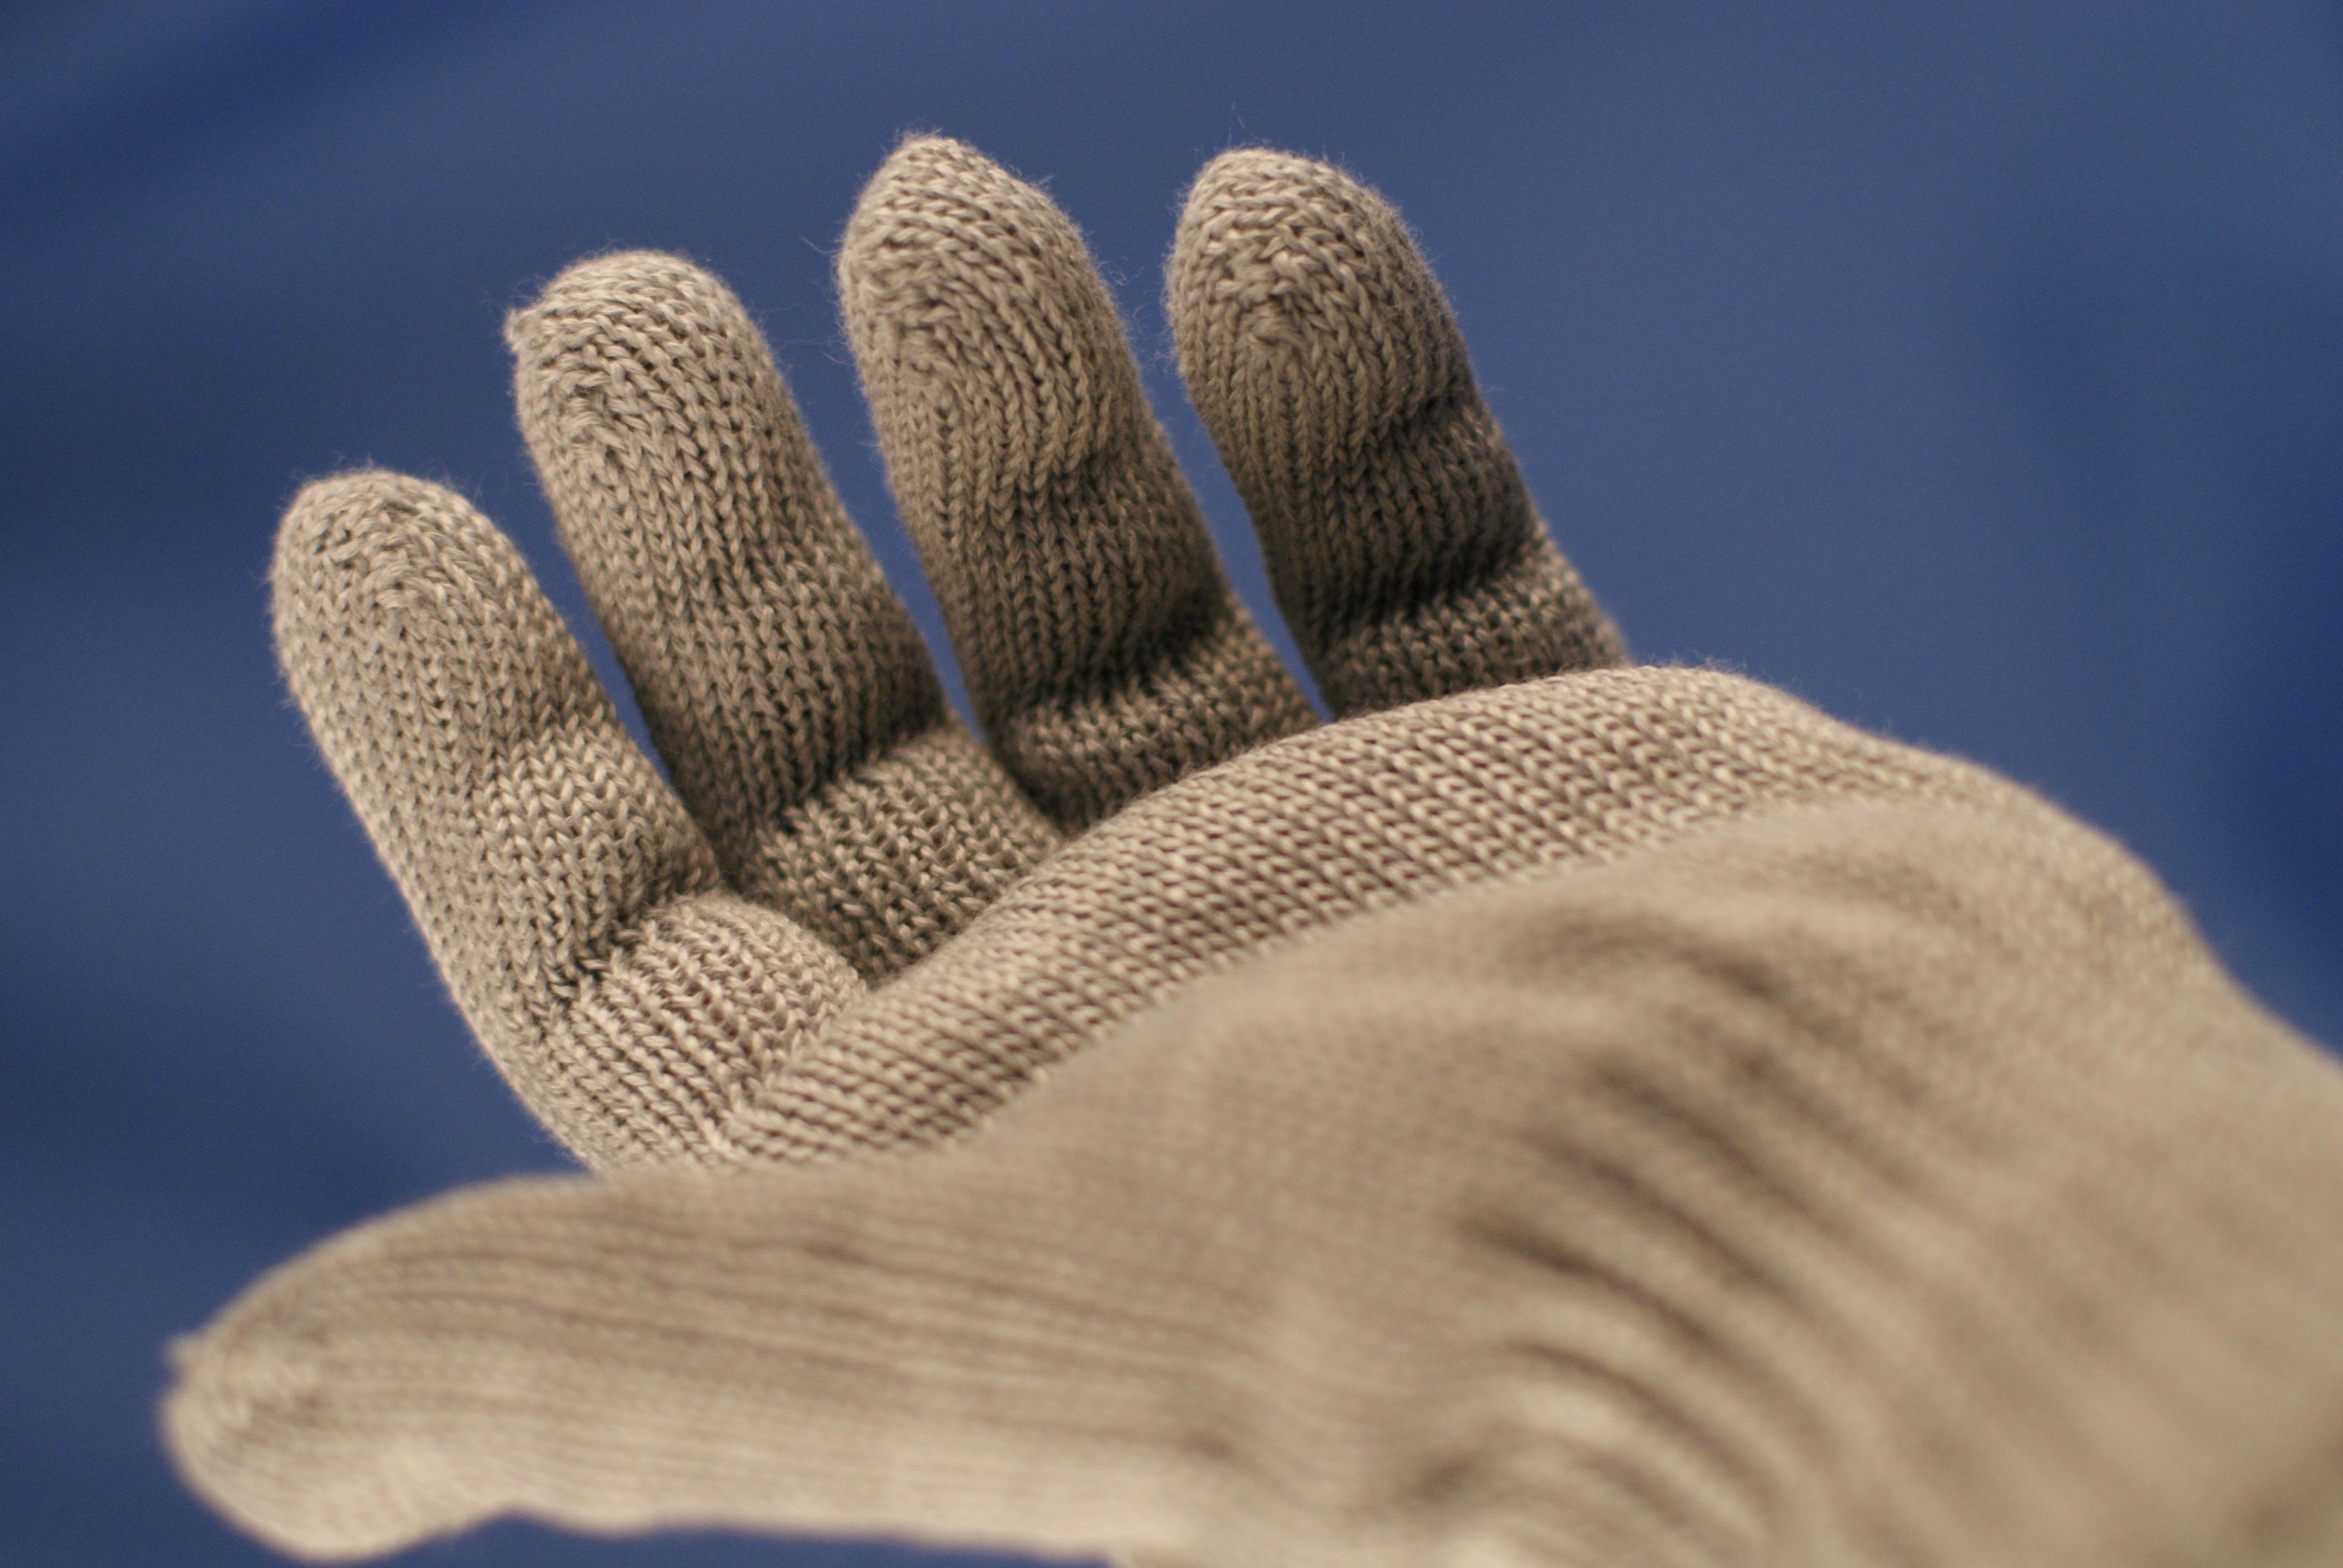 aramid glove for cut resistance